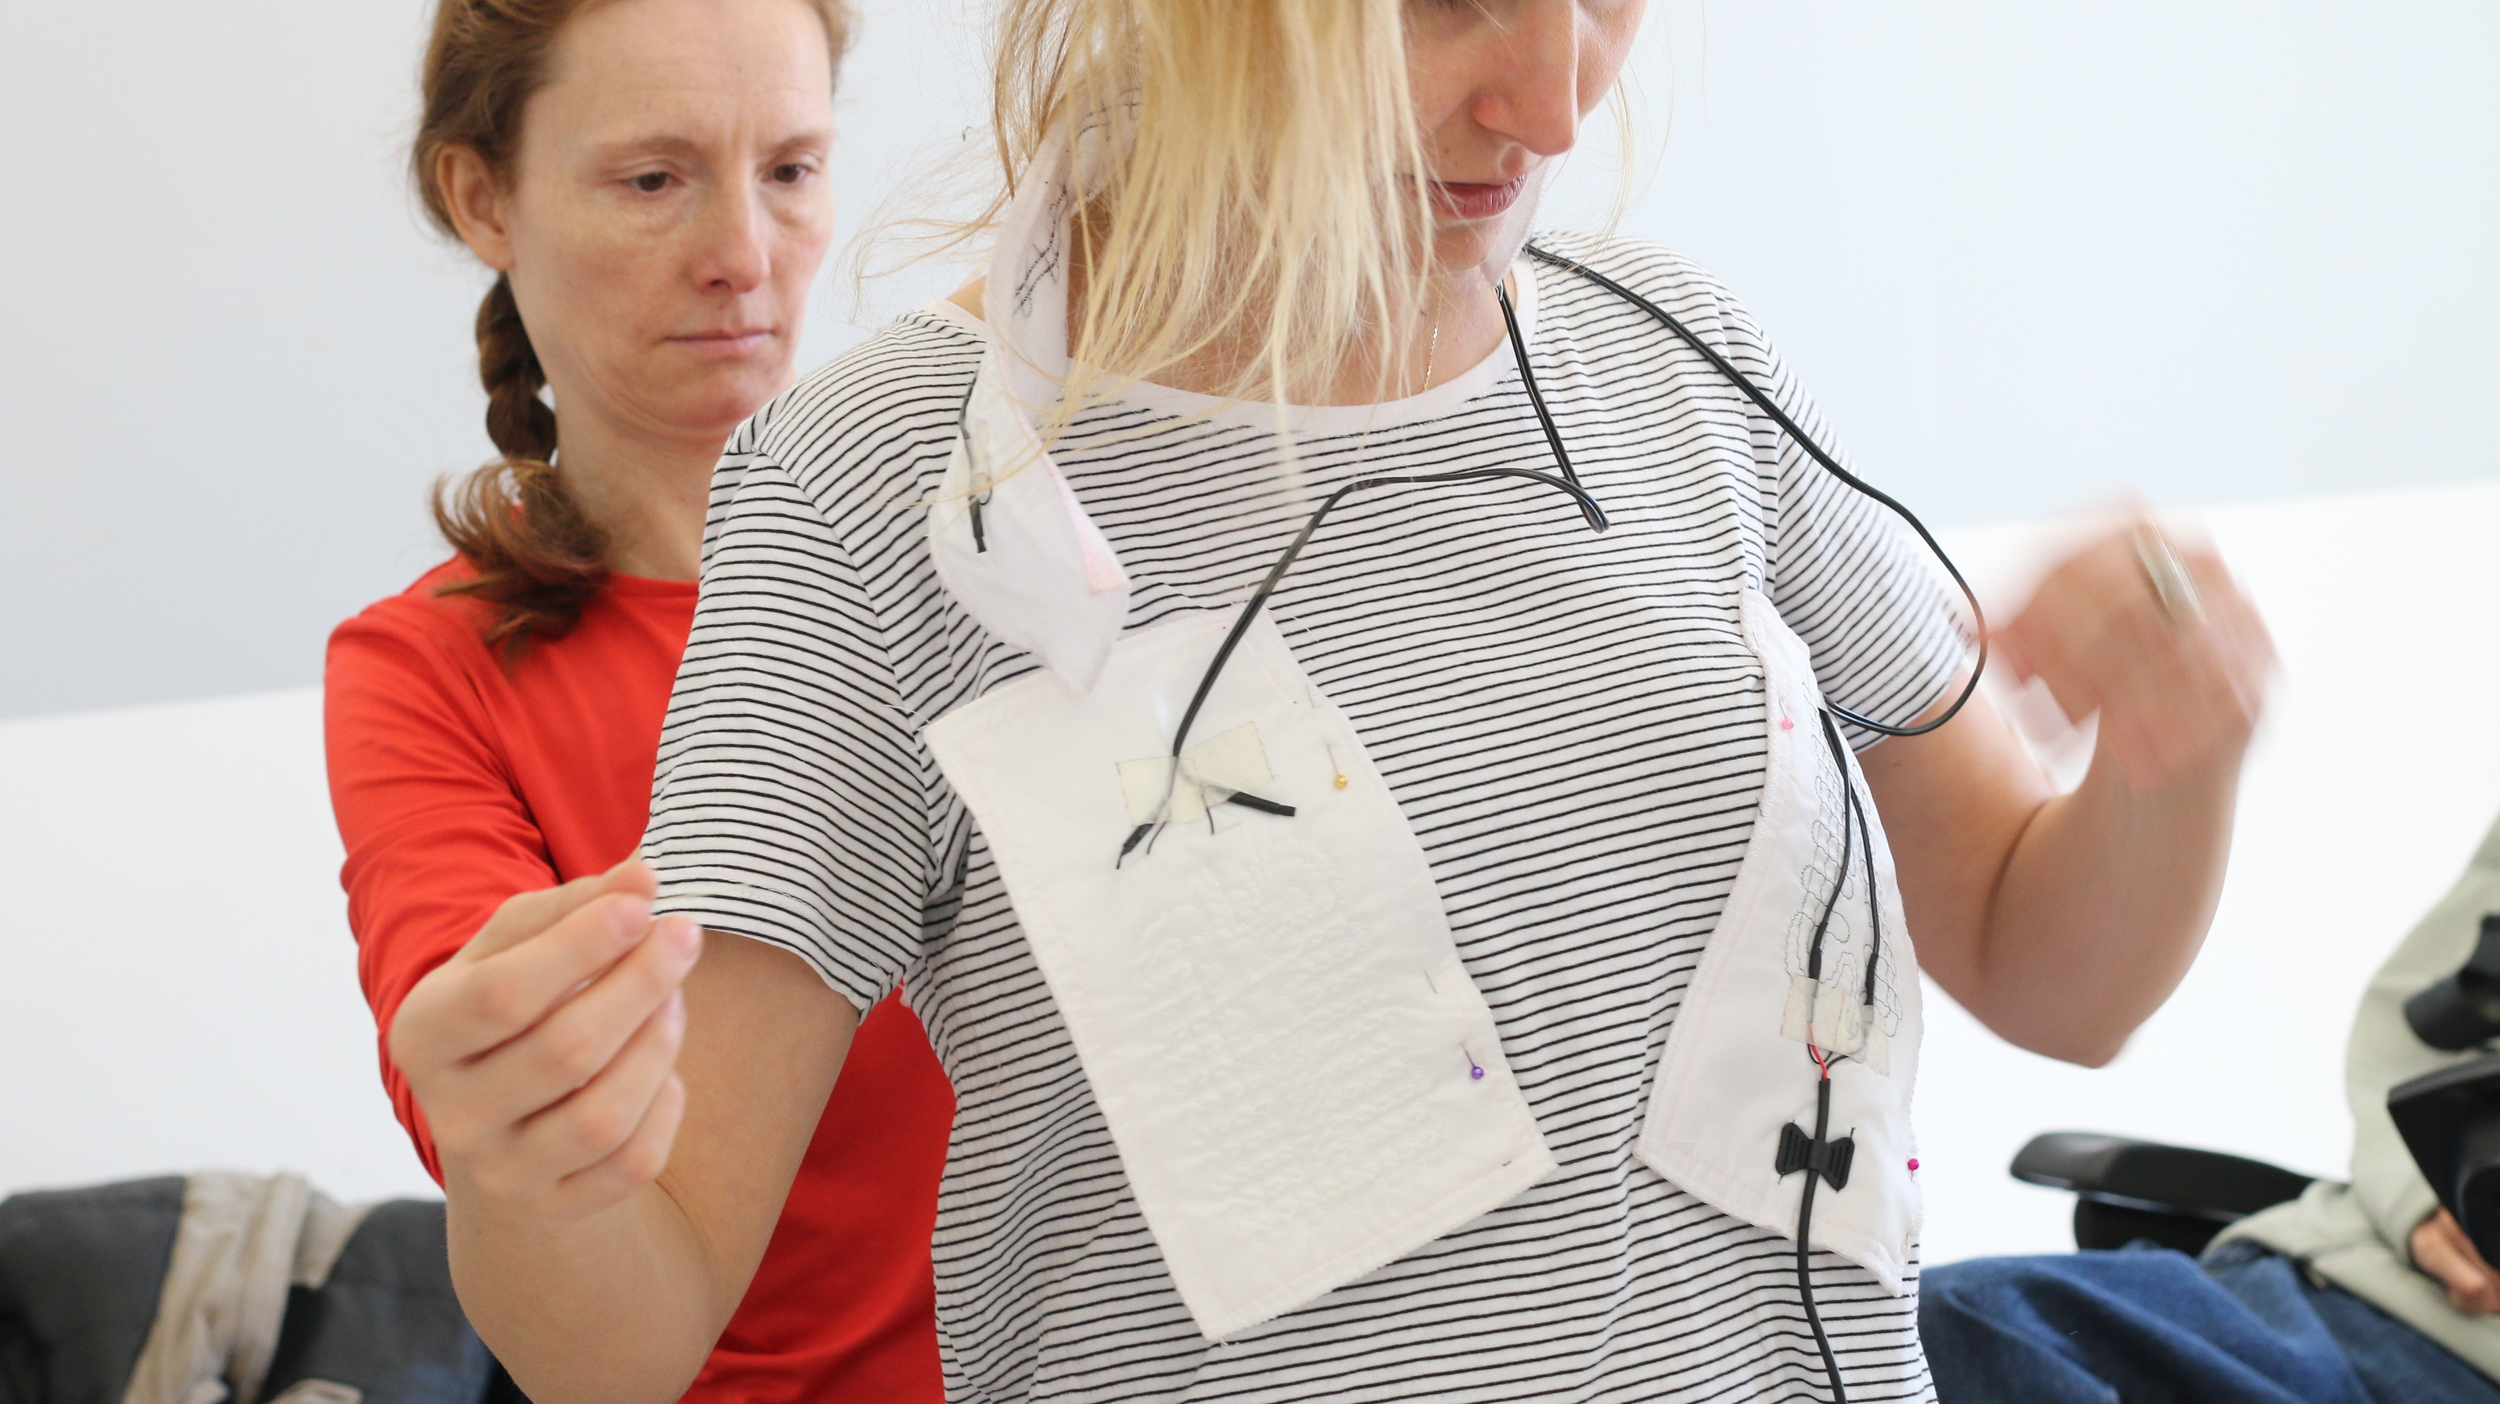 Evrim Büyükaslan testing the heating pads for her team's garment solution.